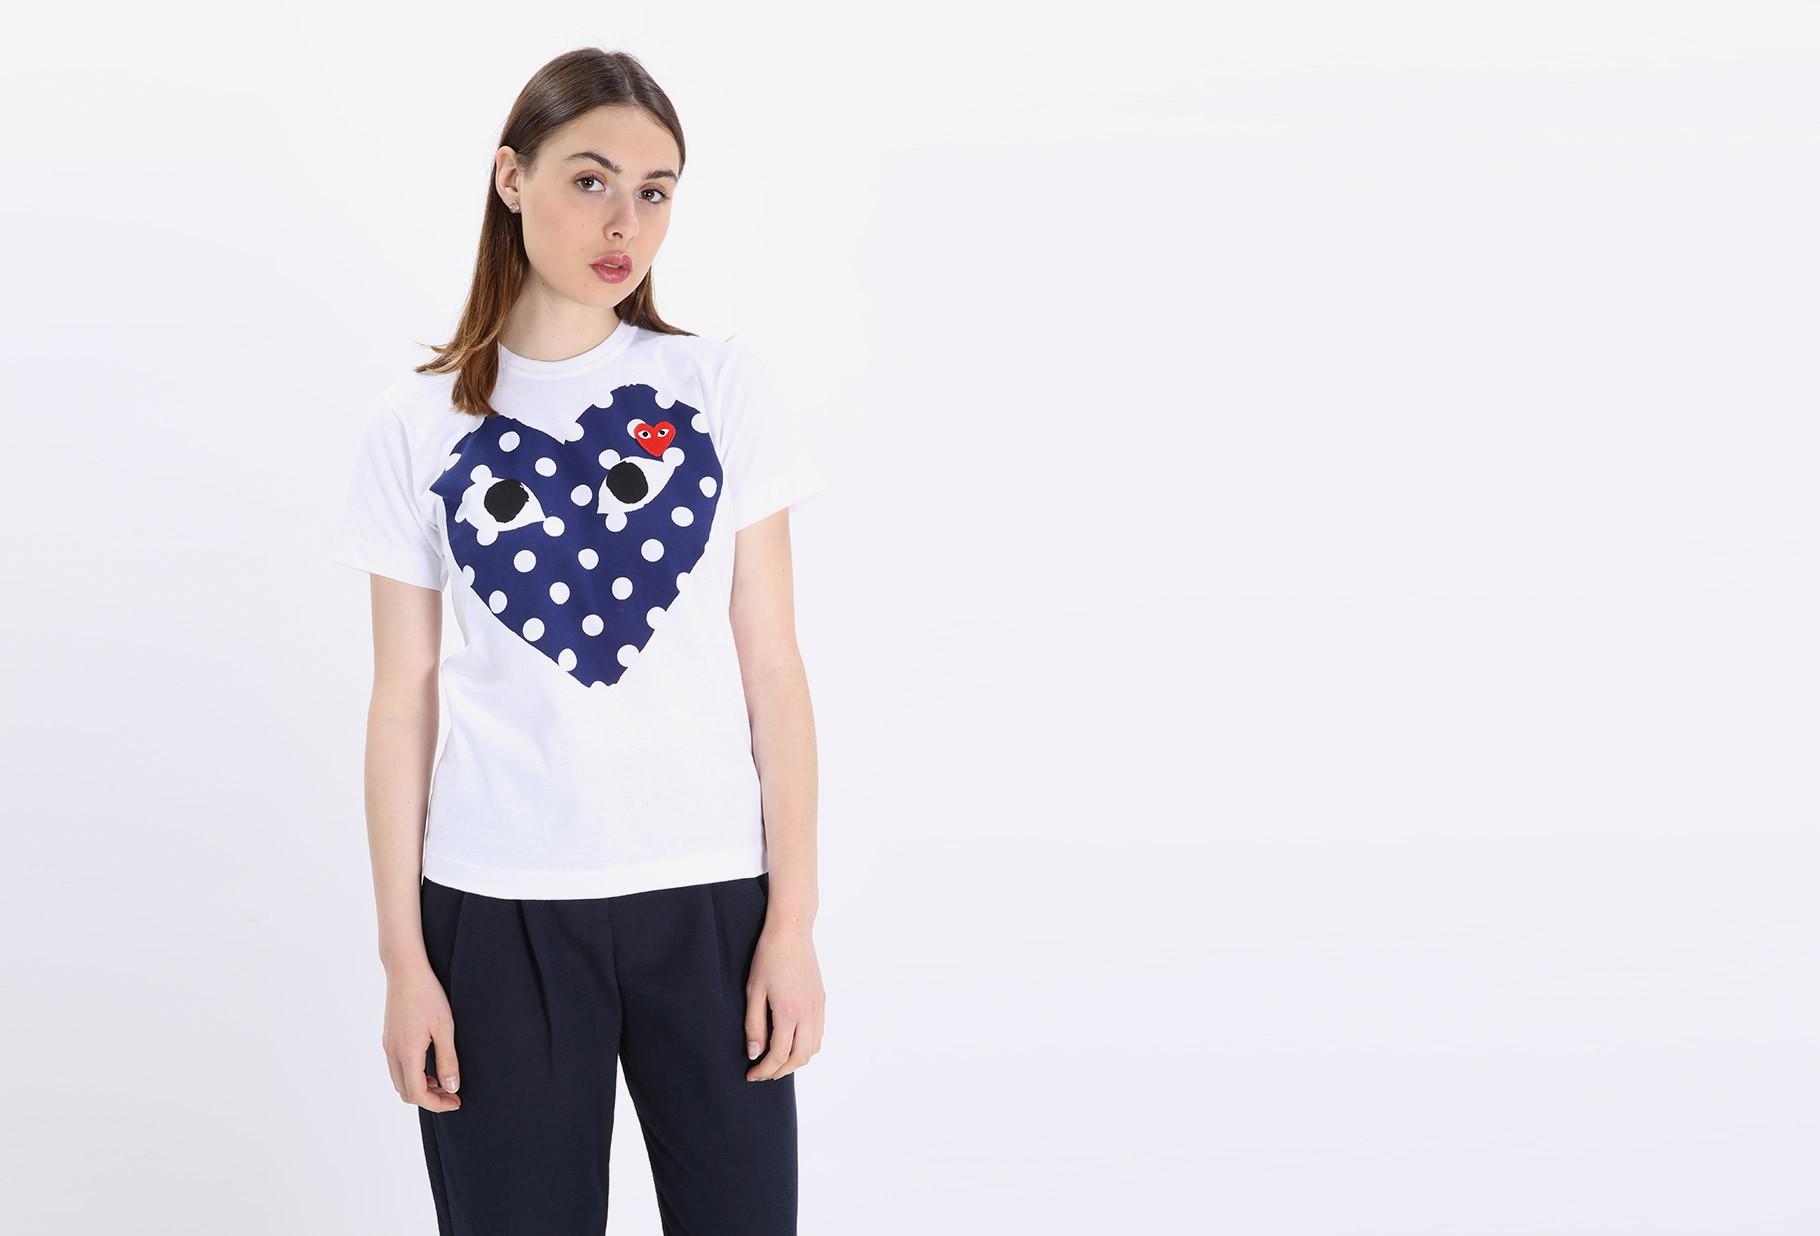 COMME DES GARÇONS PLAY WOMAN / Play polka dot t-shirt White